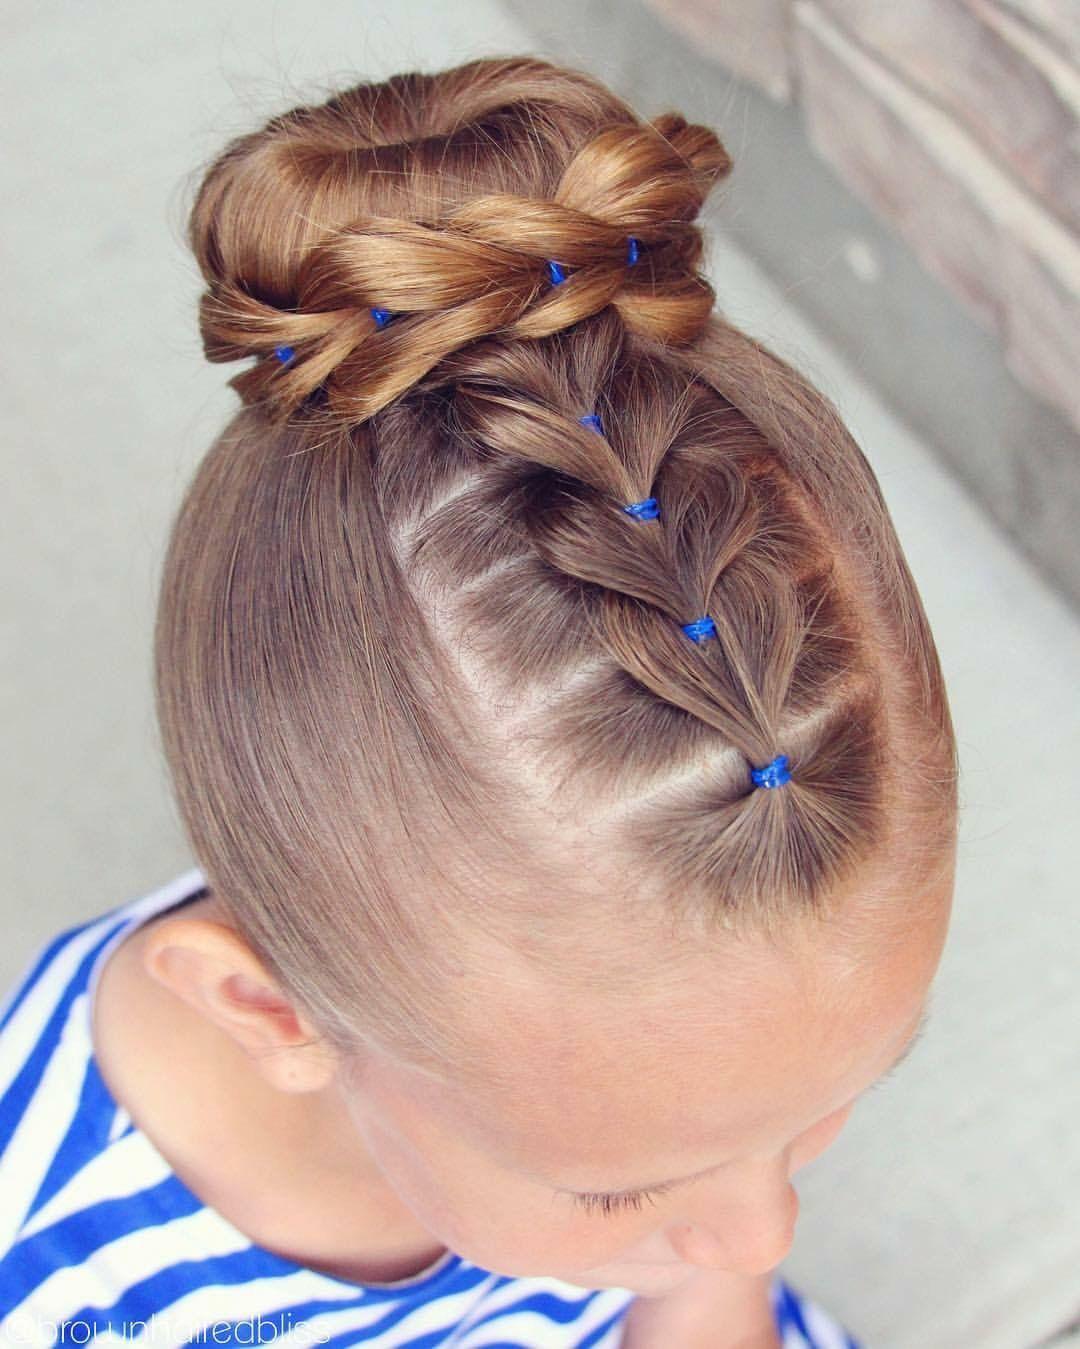 Girls Hairstyle Breads Hair Hair Styles Little Girl Hairstyles Girl Hair Dos